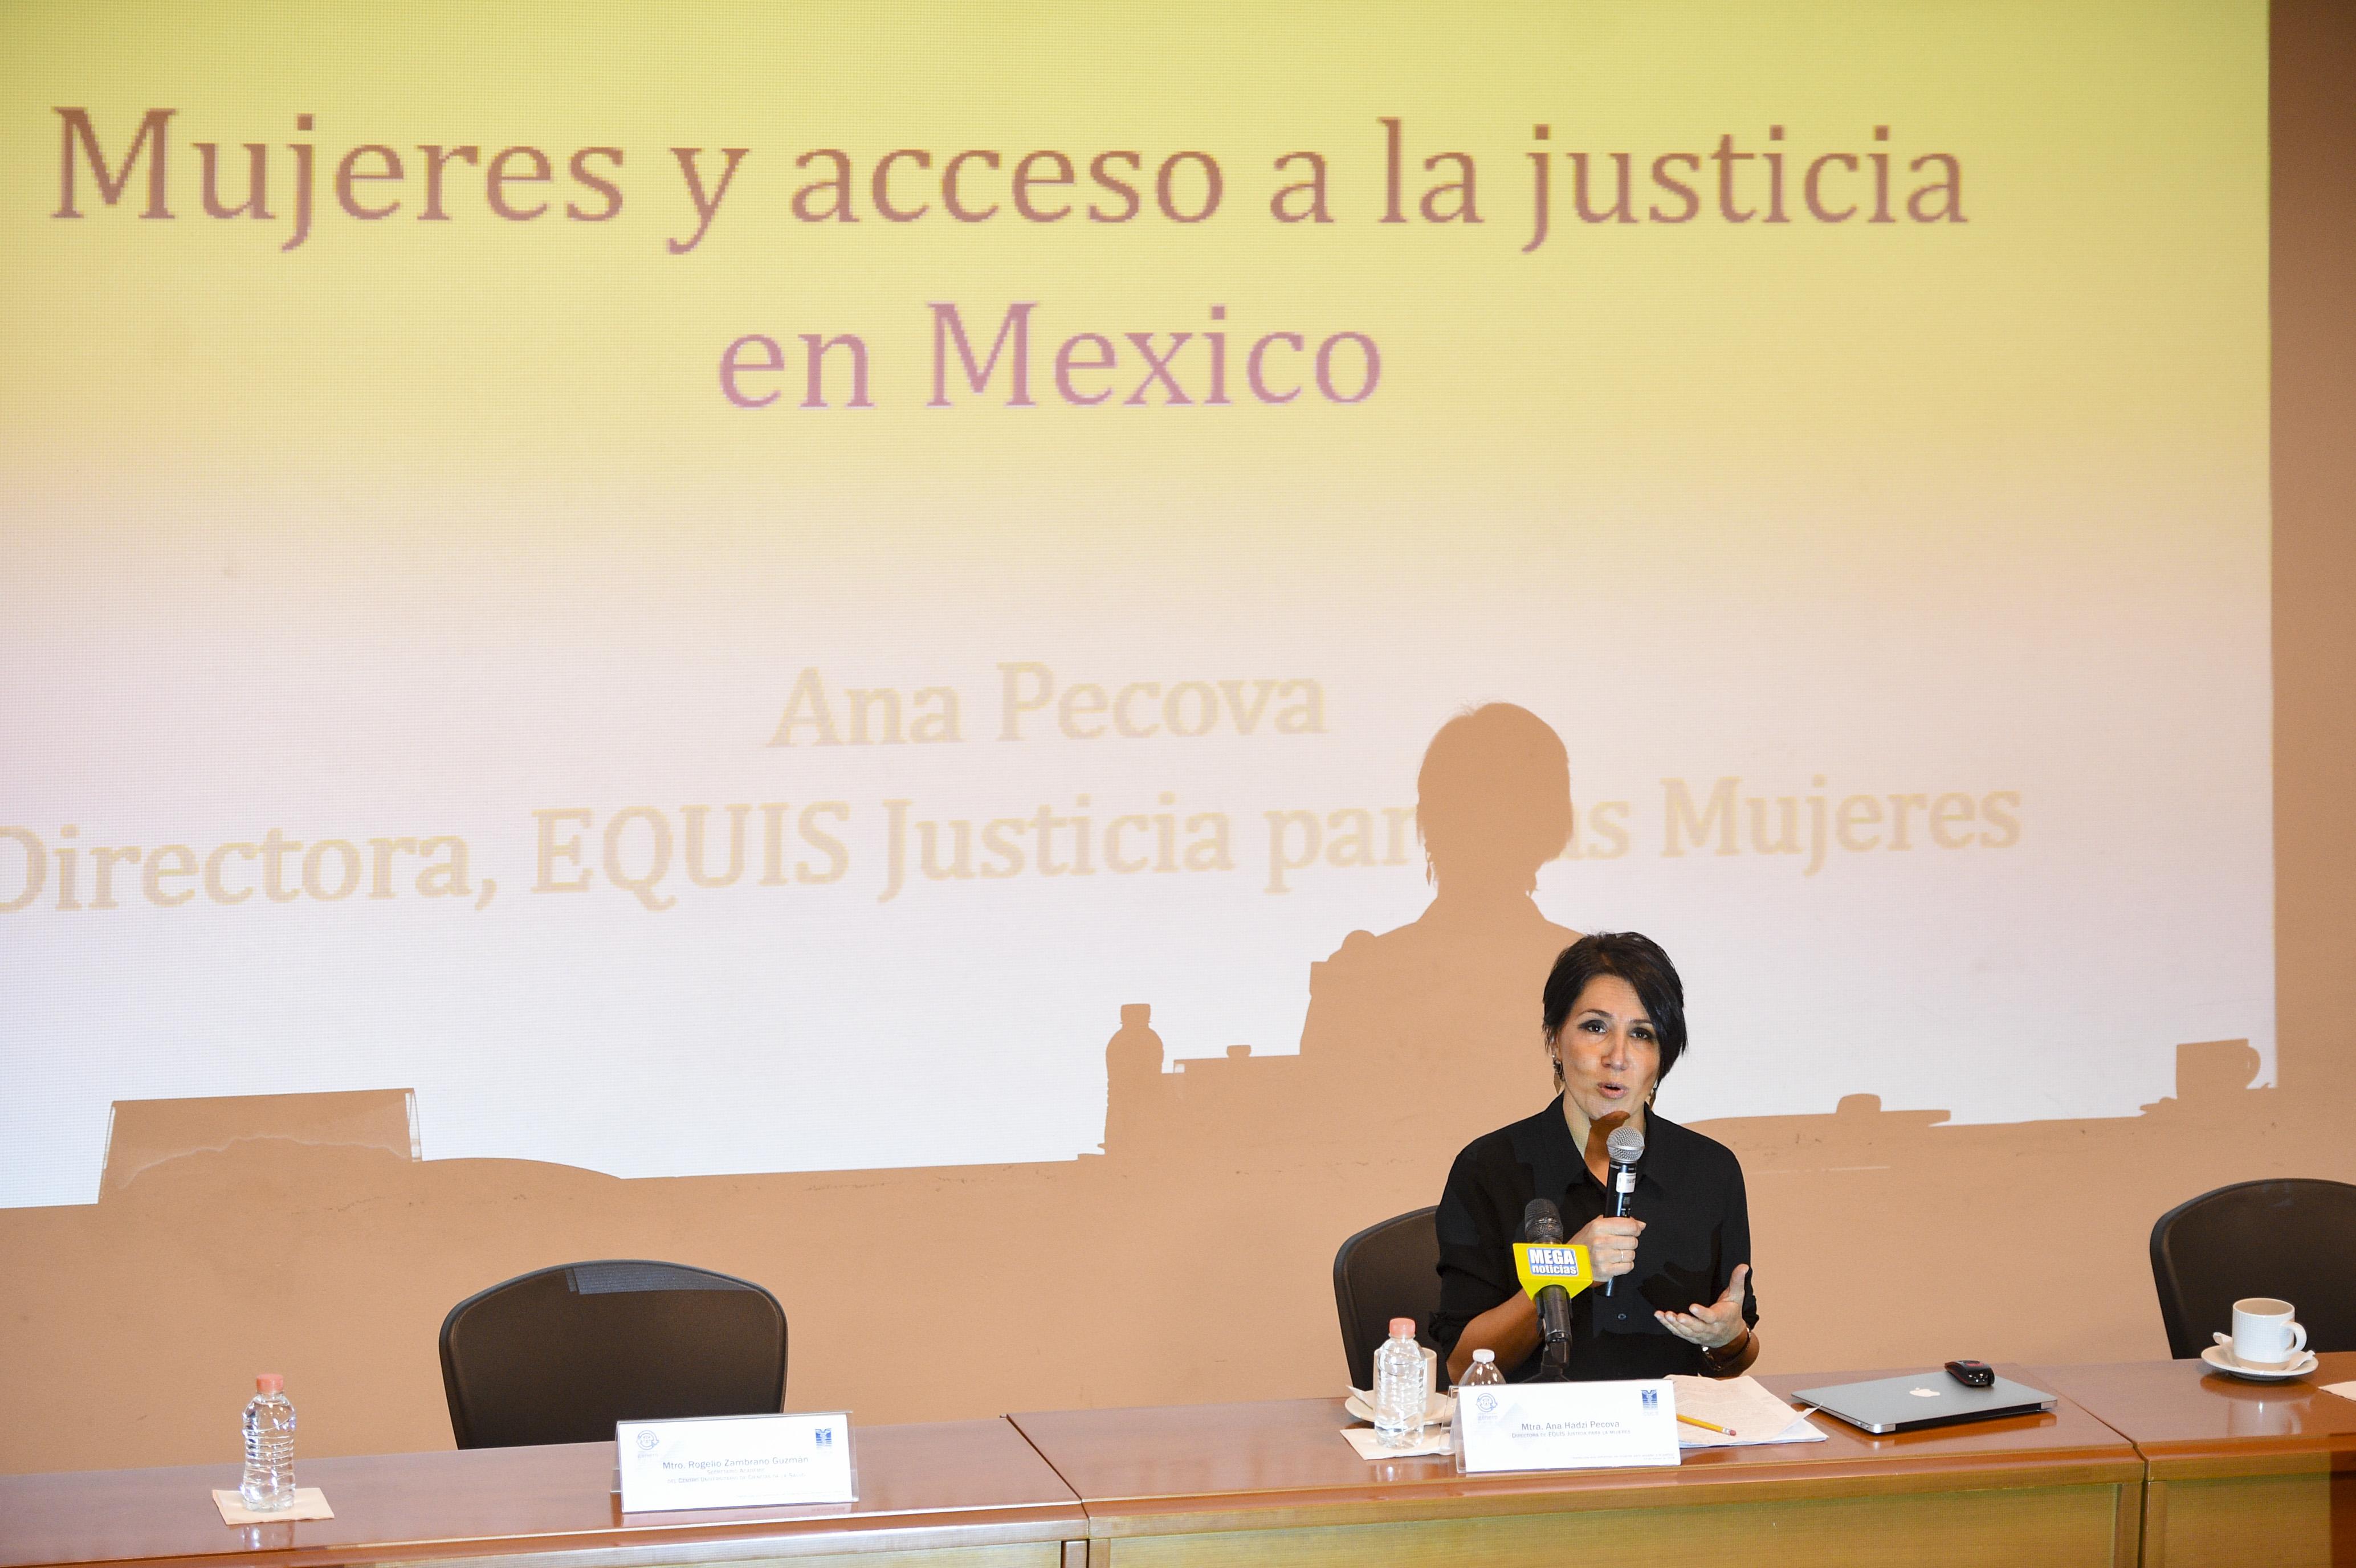 Dra. Ana Pecova dictando conferencia 3